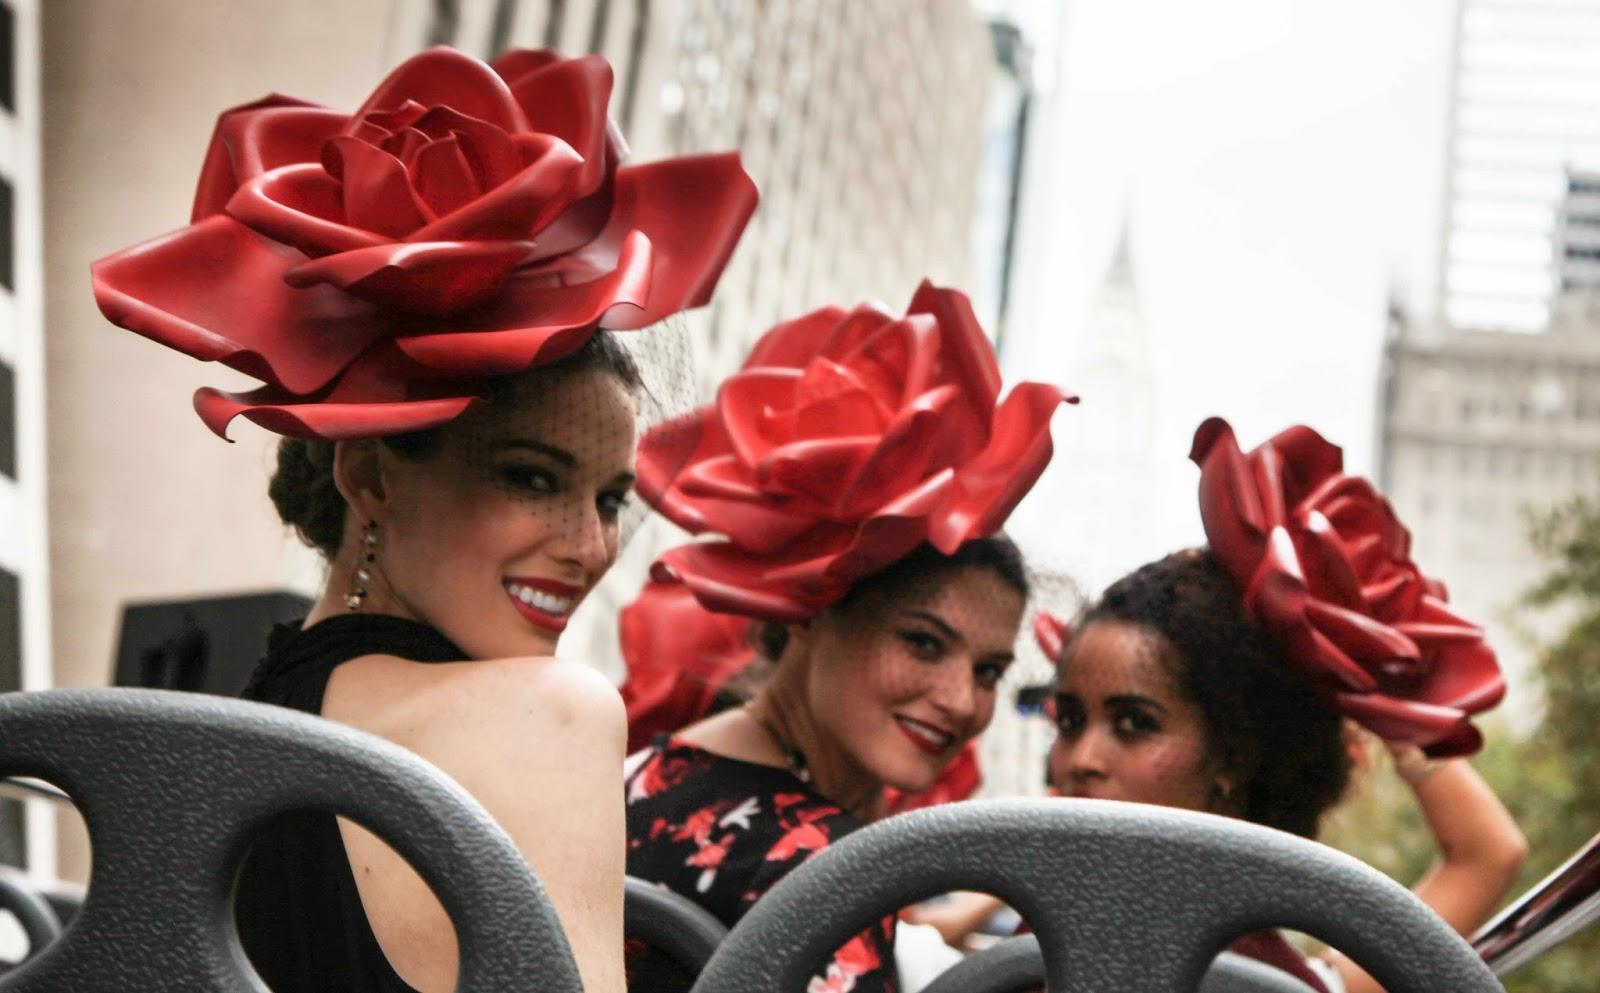 Eva Mendes NYC fashion event Sept 2014